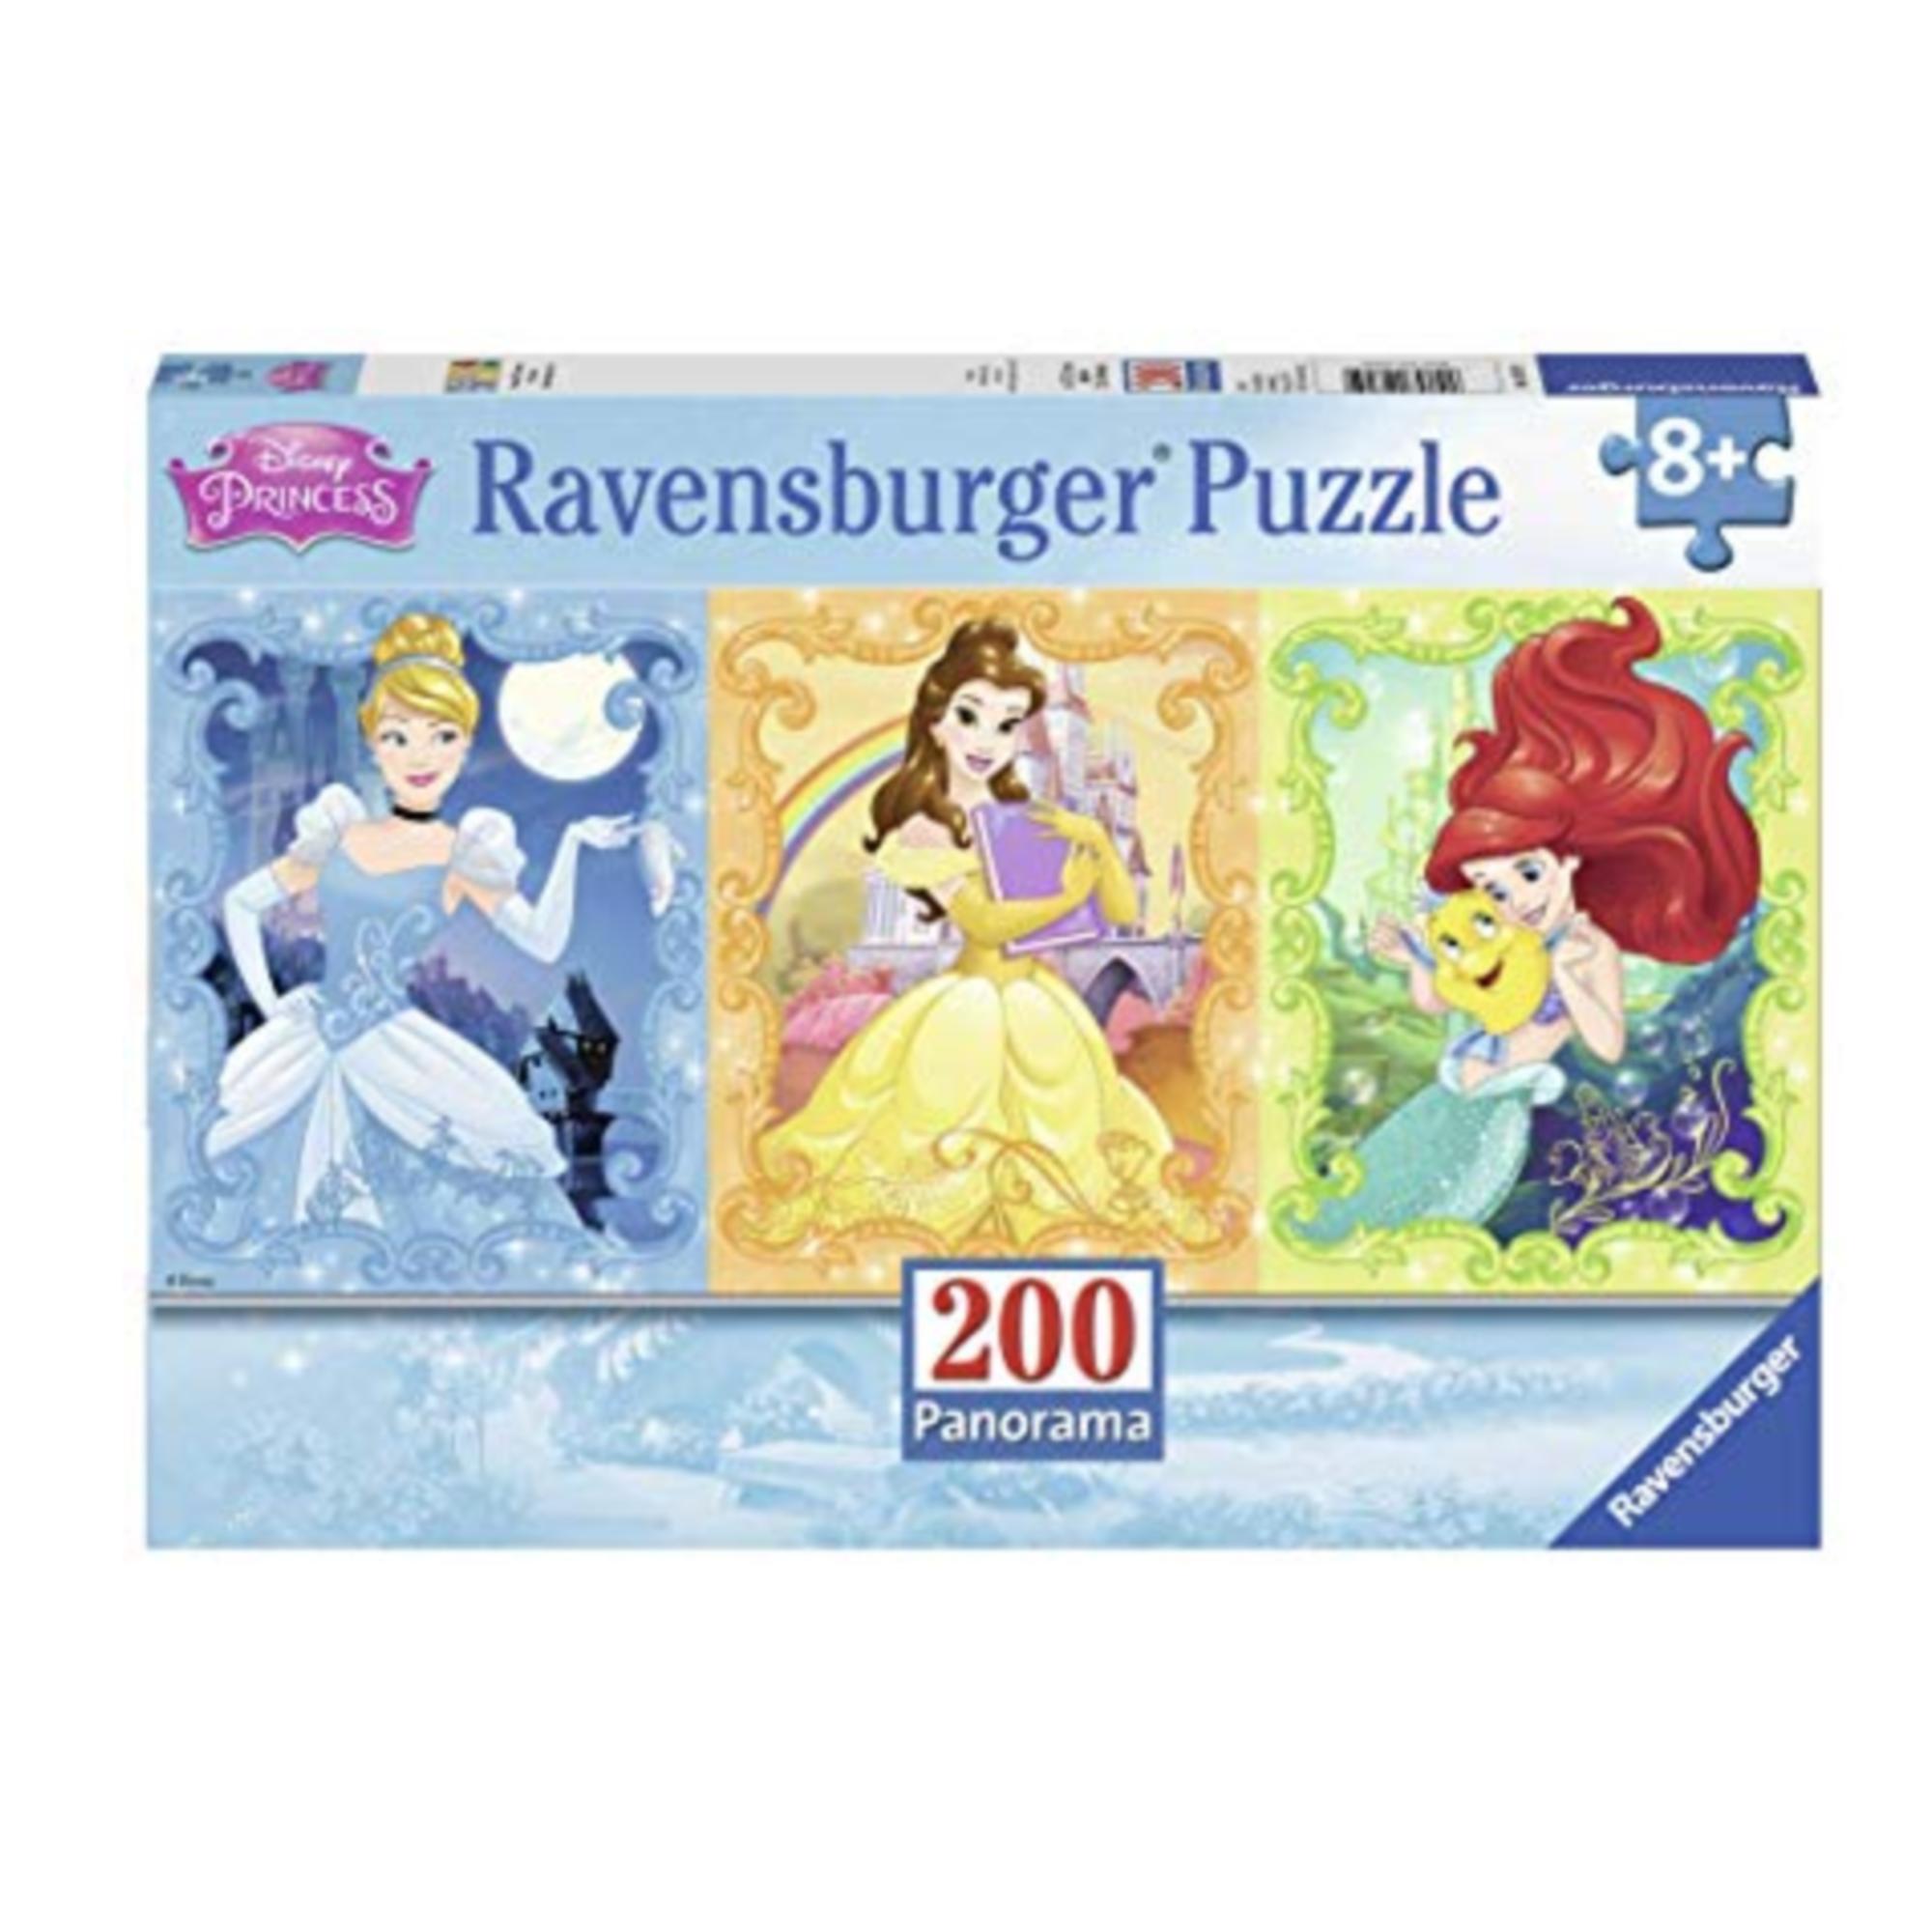 Ravensburger Puzzle 200 Panorama: Jolies princesses Disney